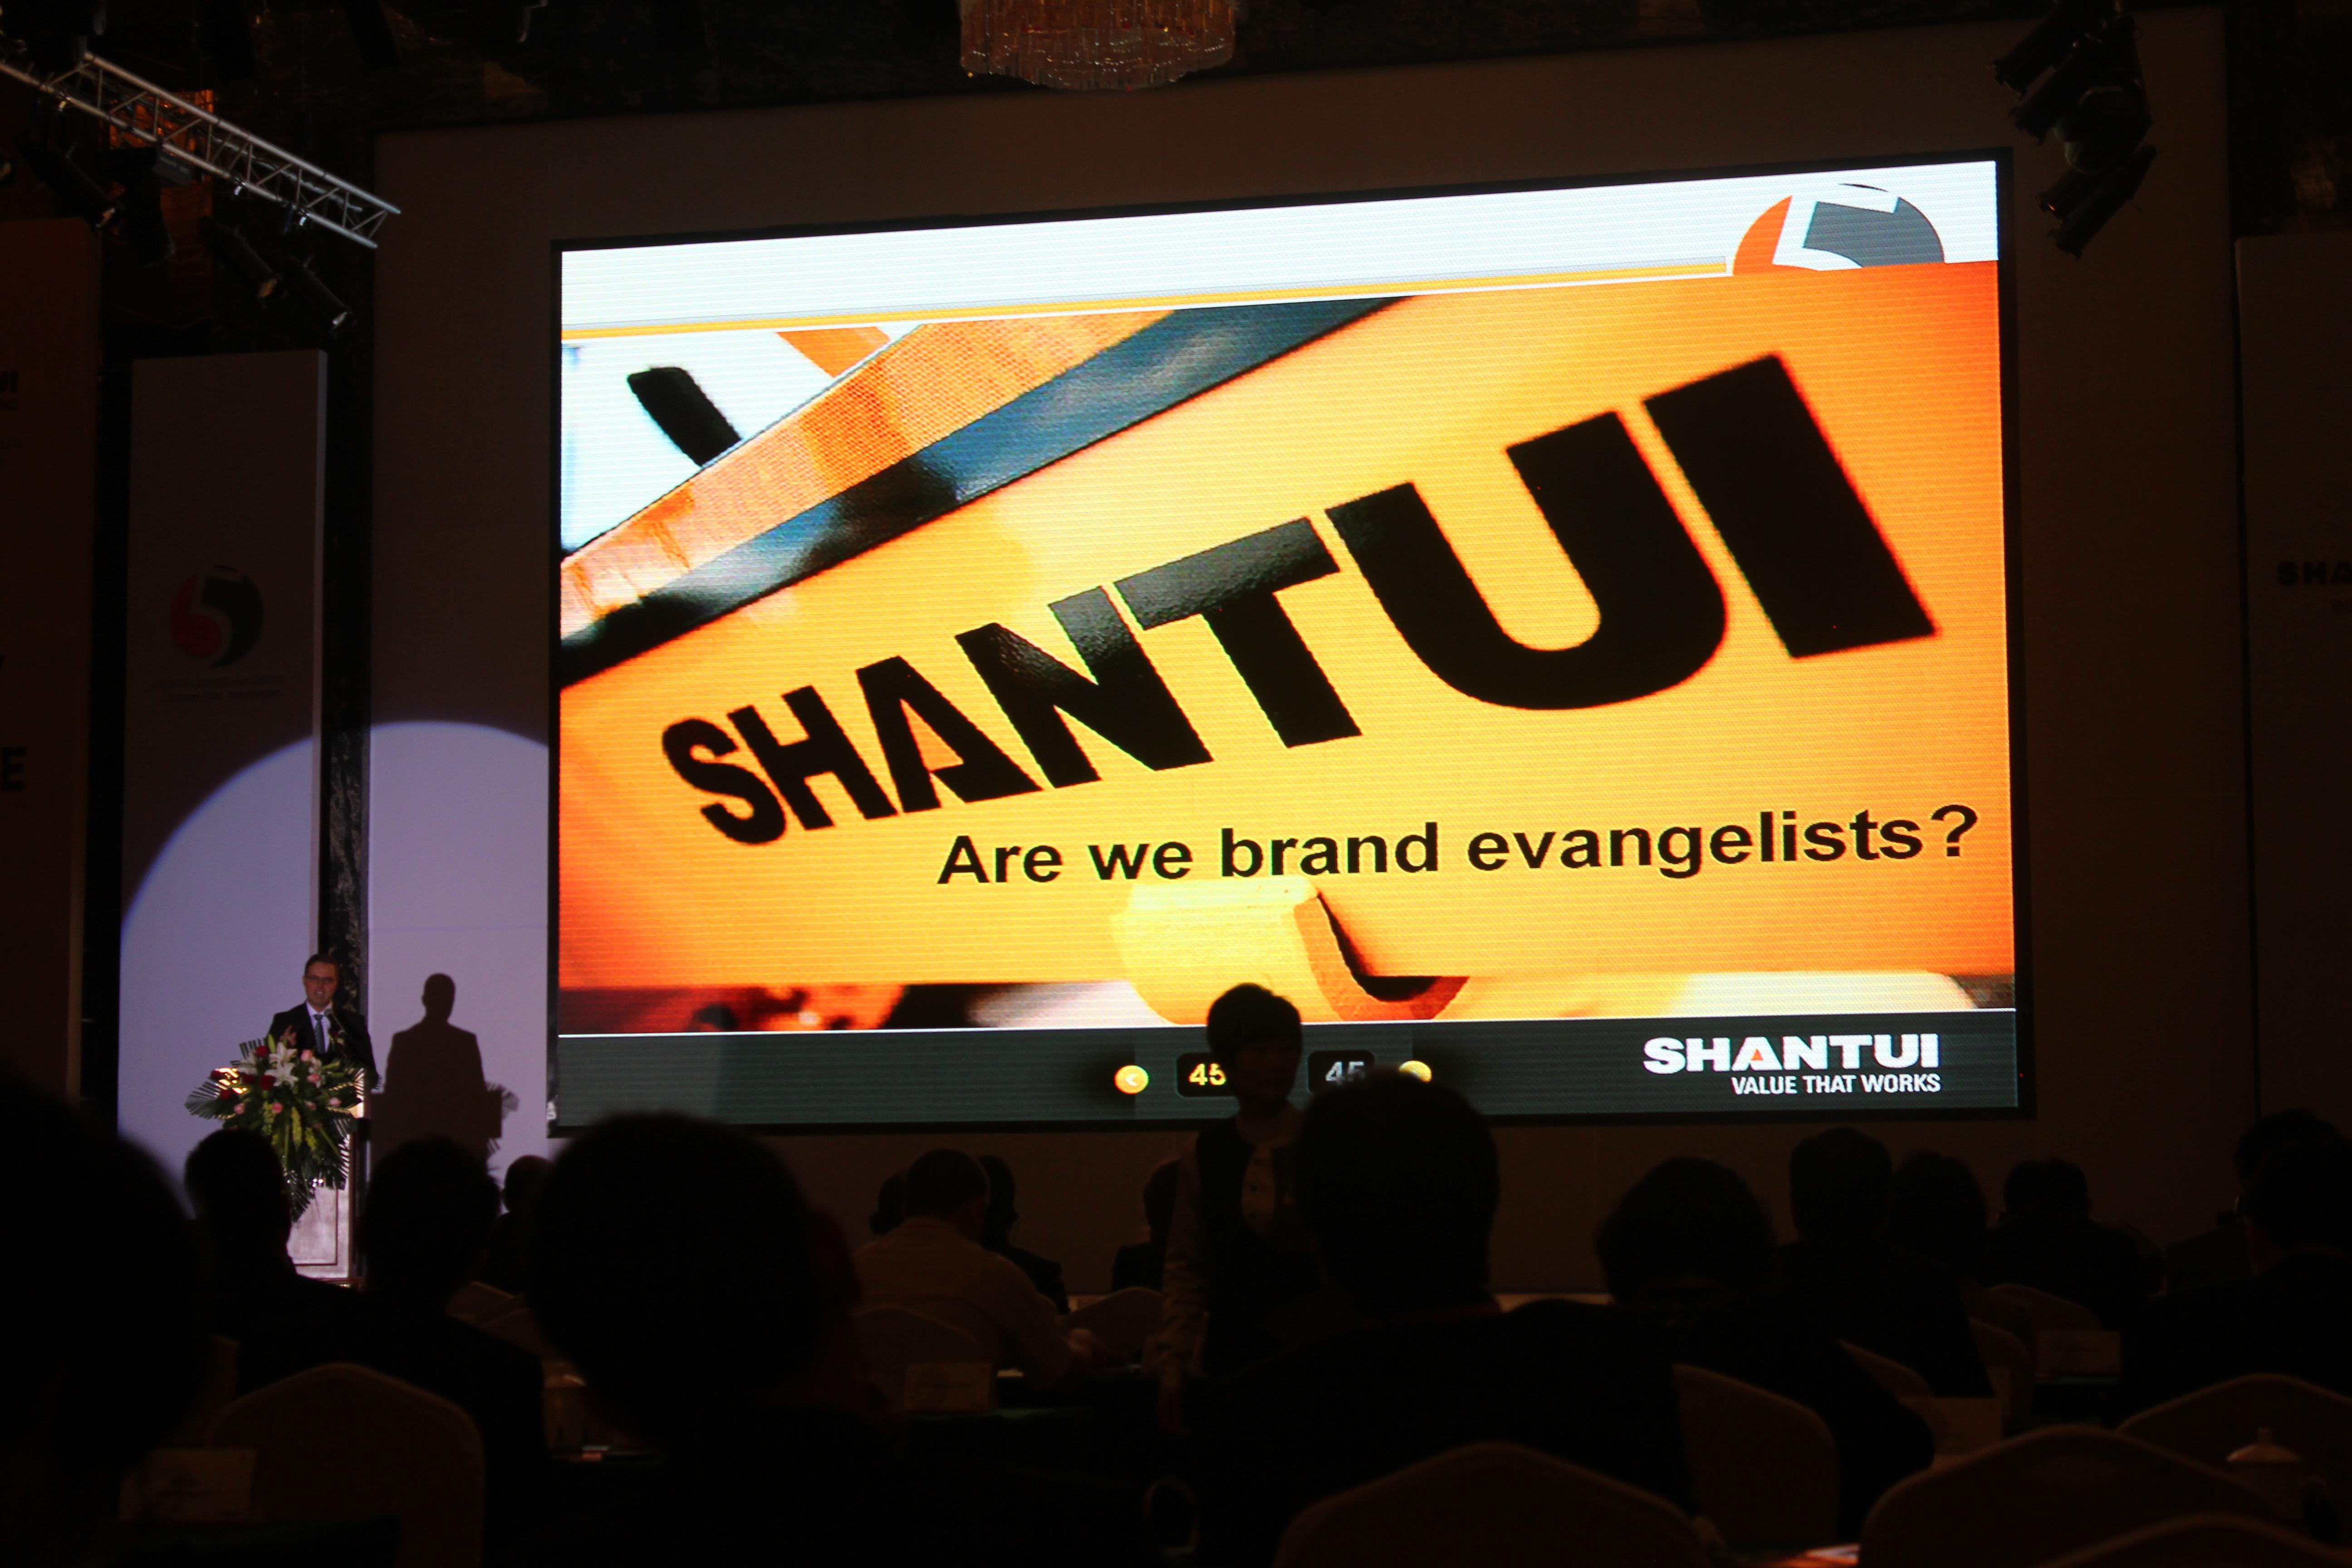 SHANTUI Brand